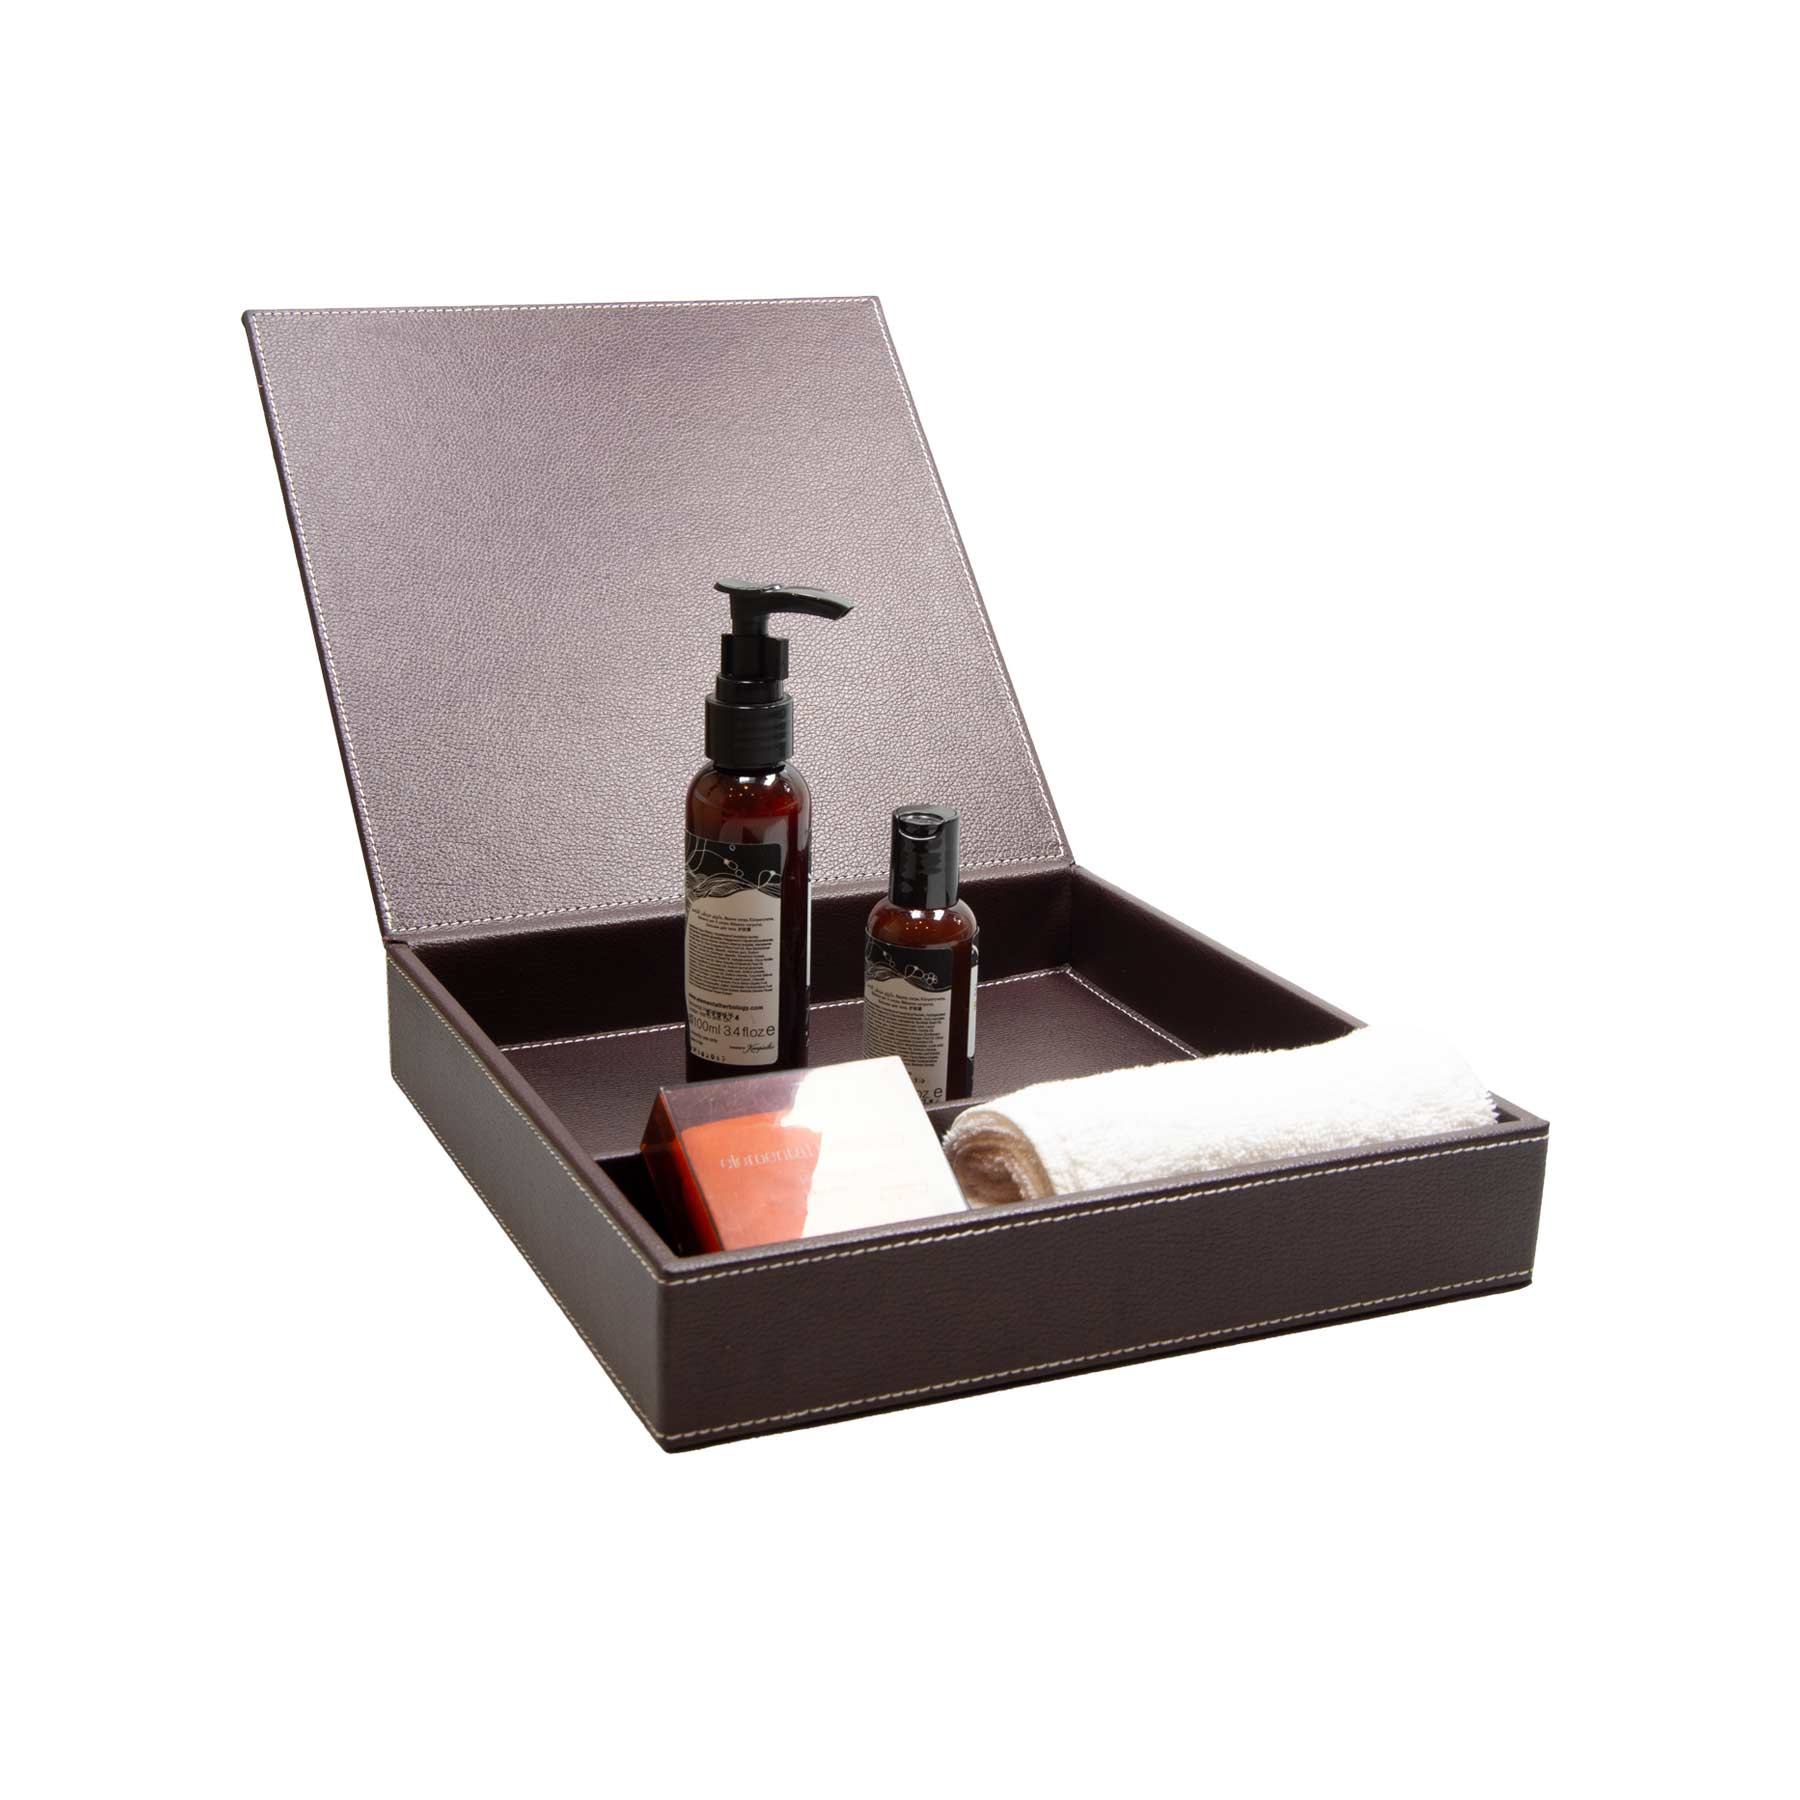 amenitybox-leder-pflegeartikel_box-hochwertig